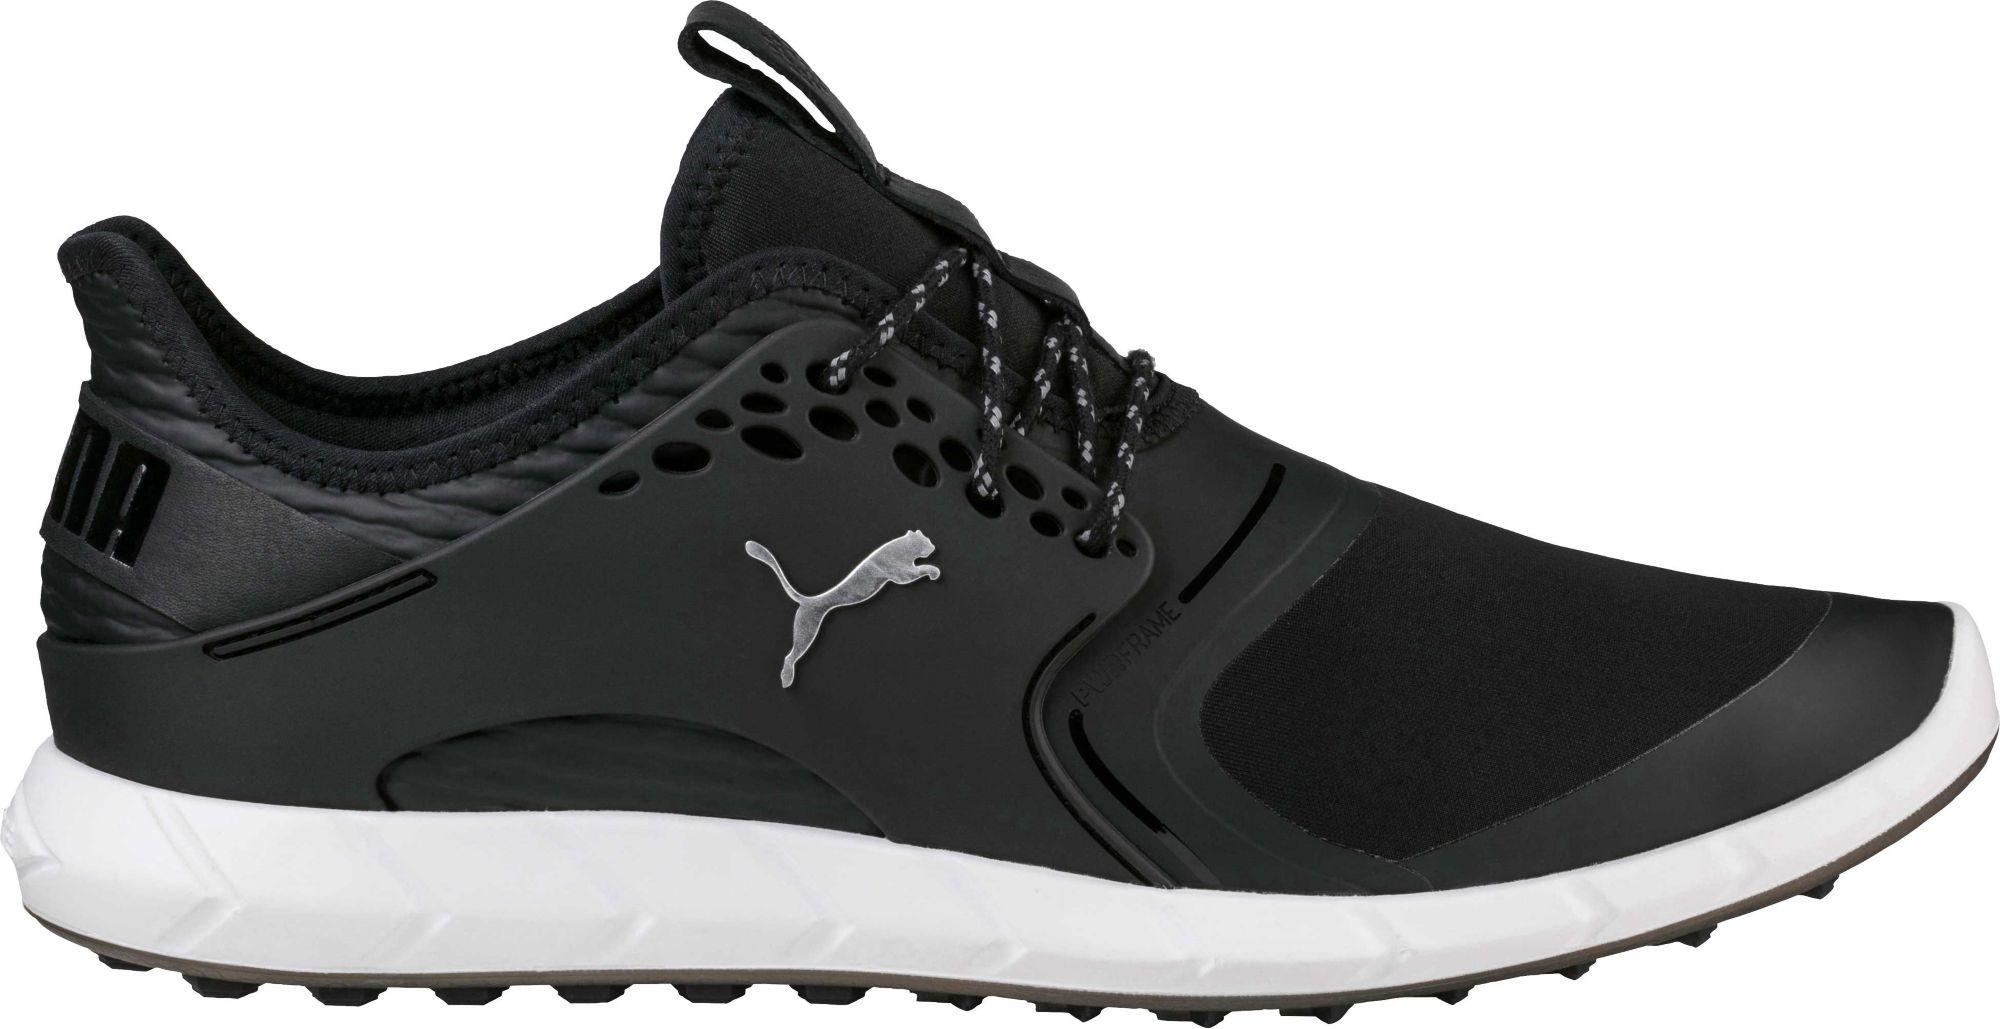 Puma Men s Ignite Pwrsport Golf Shoes  95baced01